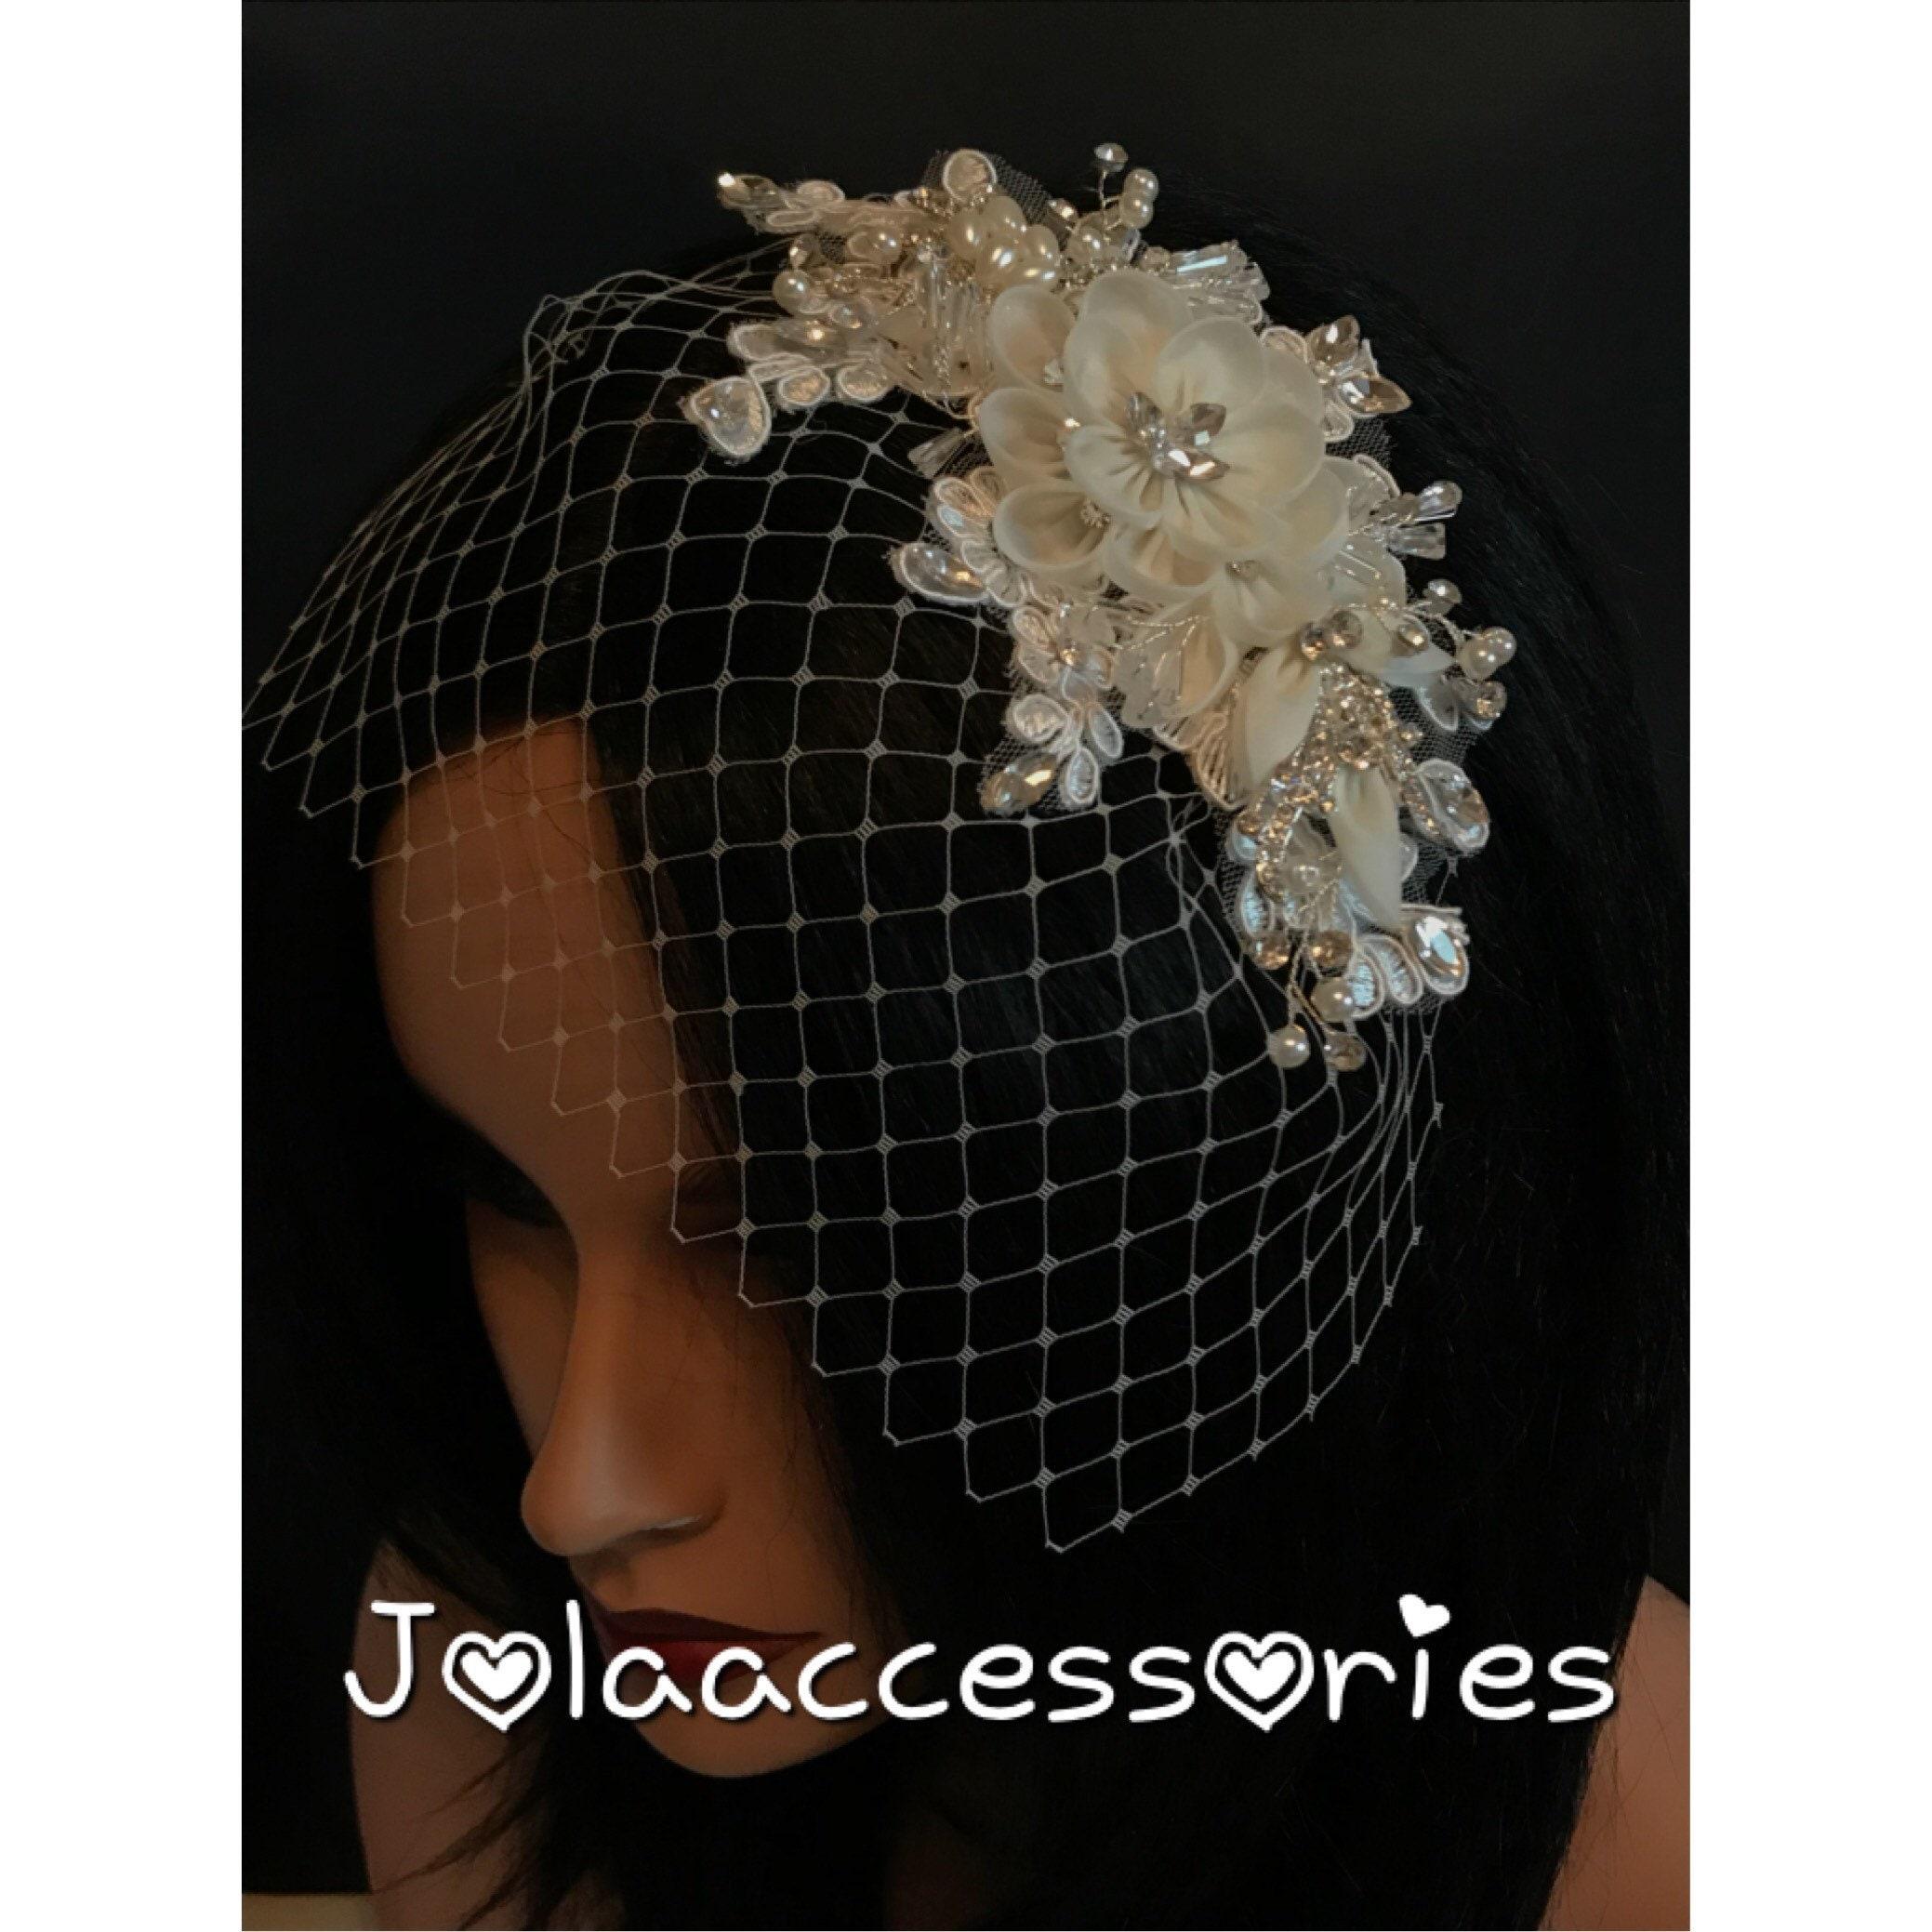 Pearl bridal veil Russian netting Birdcage Headband Veil Wedding Headpiece Vintage Style Art Deco Bridal Veil Pearl Birdcage Wedding Veil